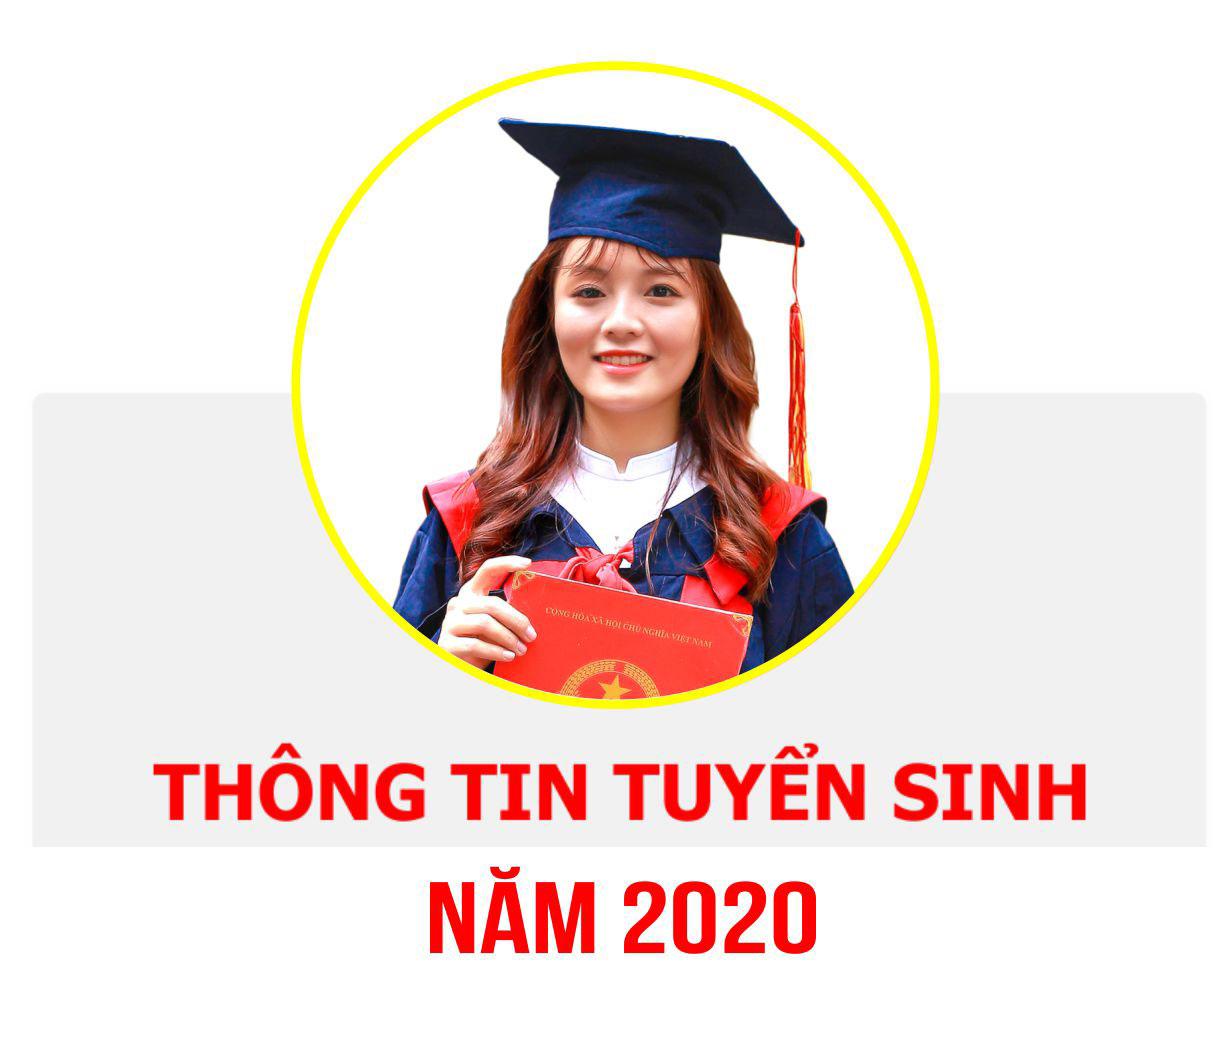 Thong tin tuyen sinh Dai hoc chinh quy, thac si, lien thong, van bang hai nam 2020